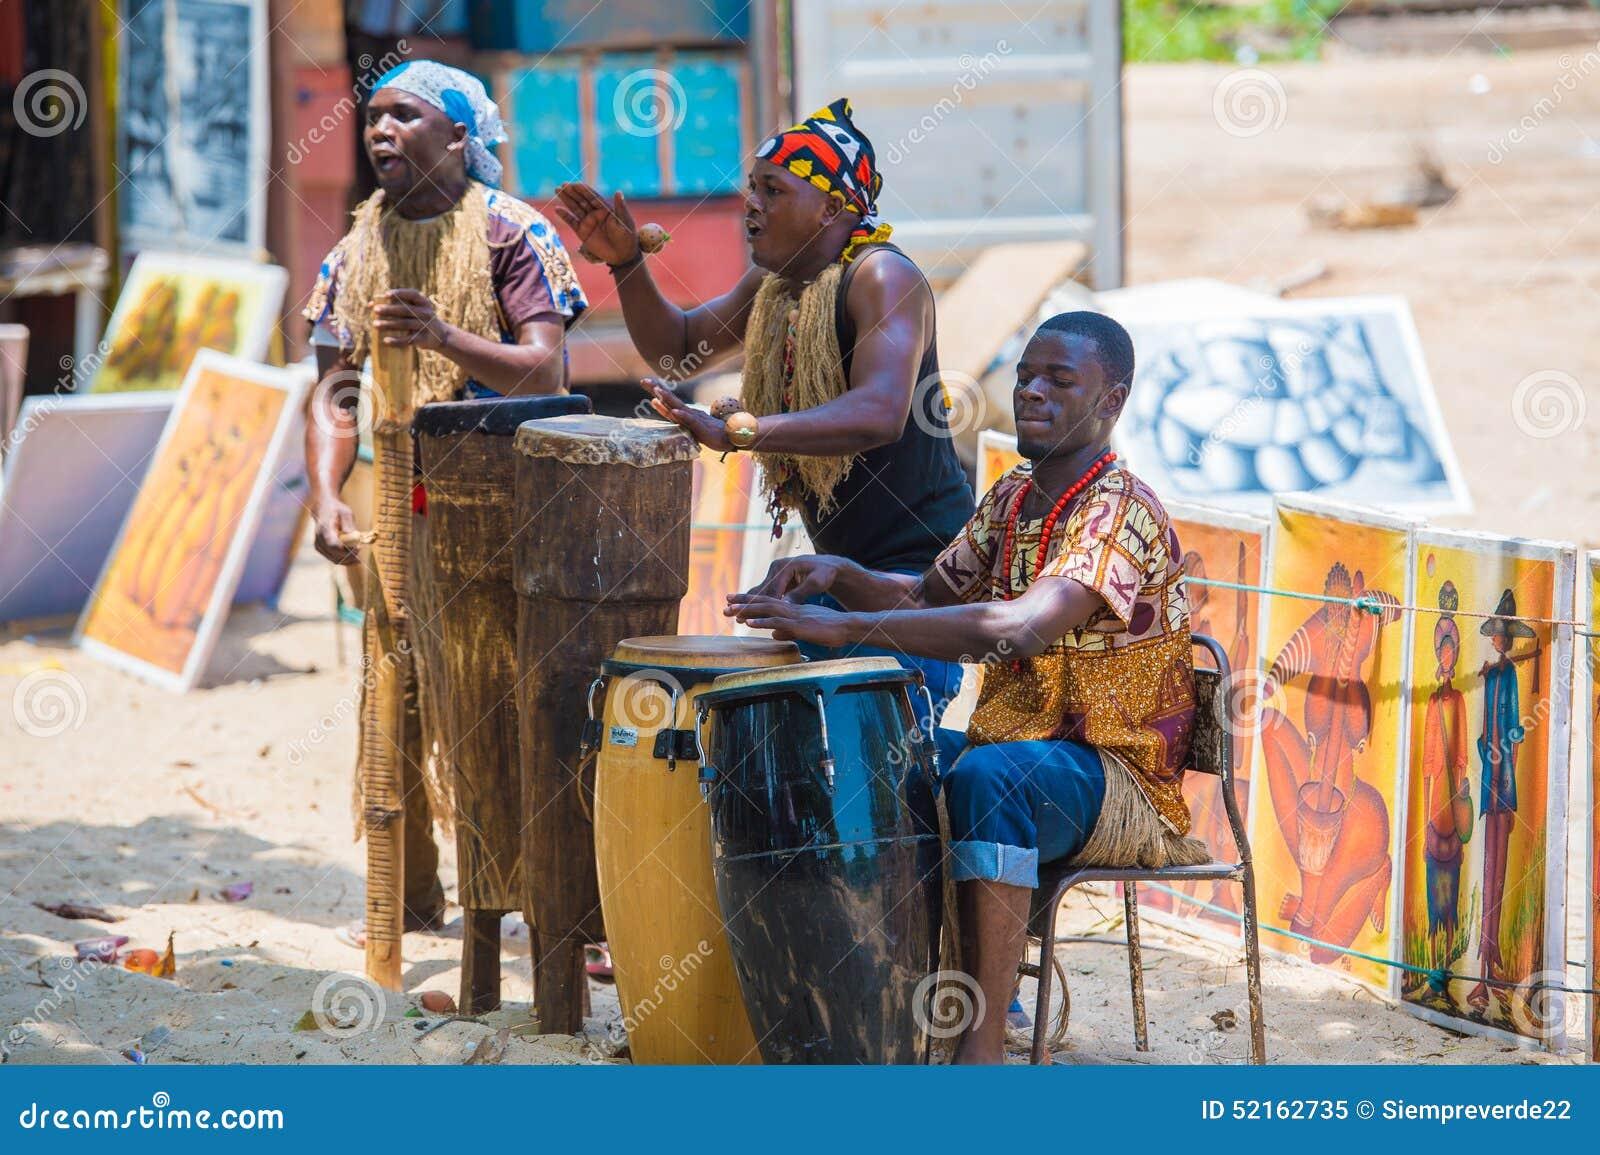 Angolan music